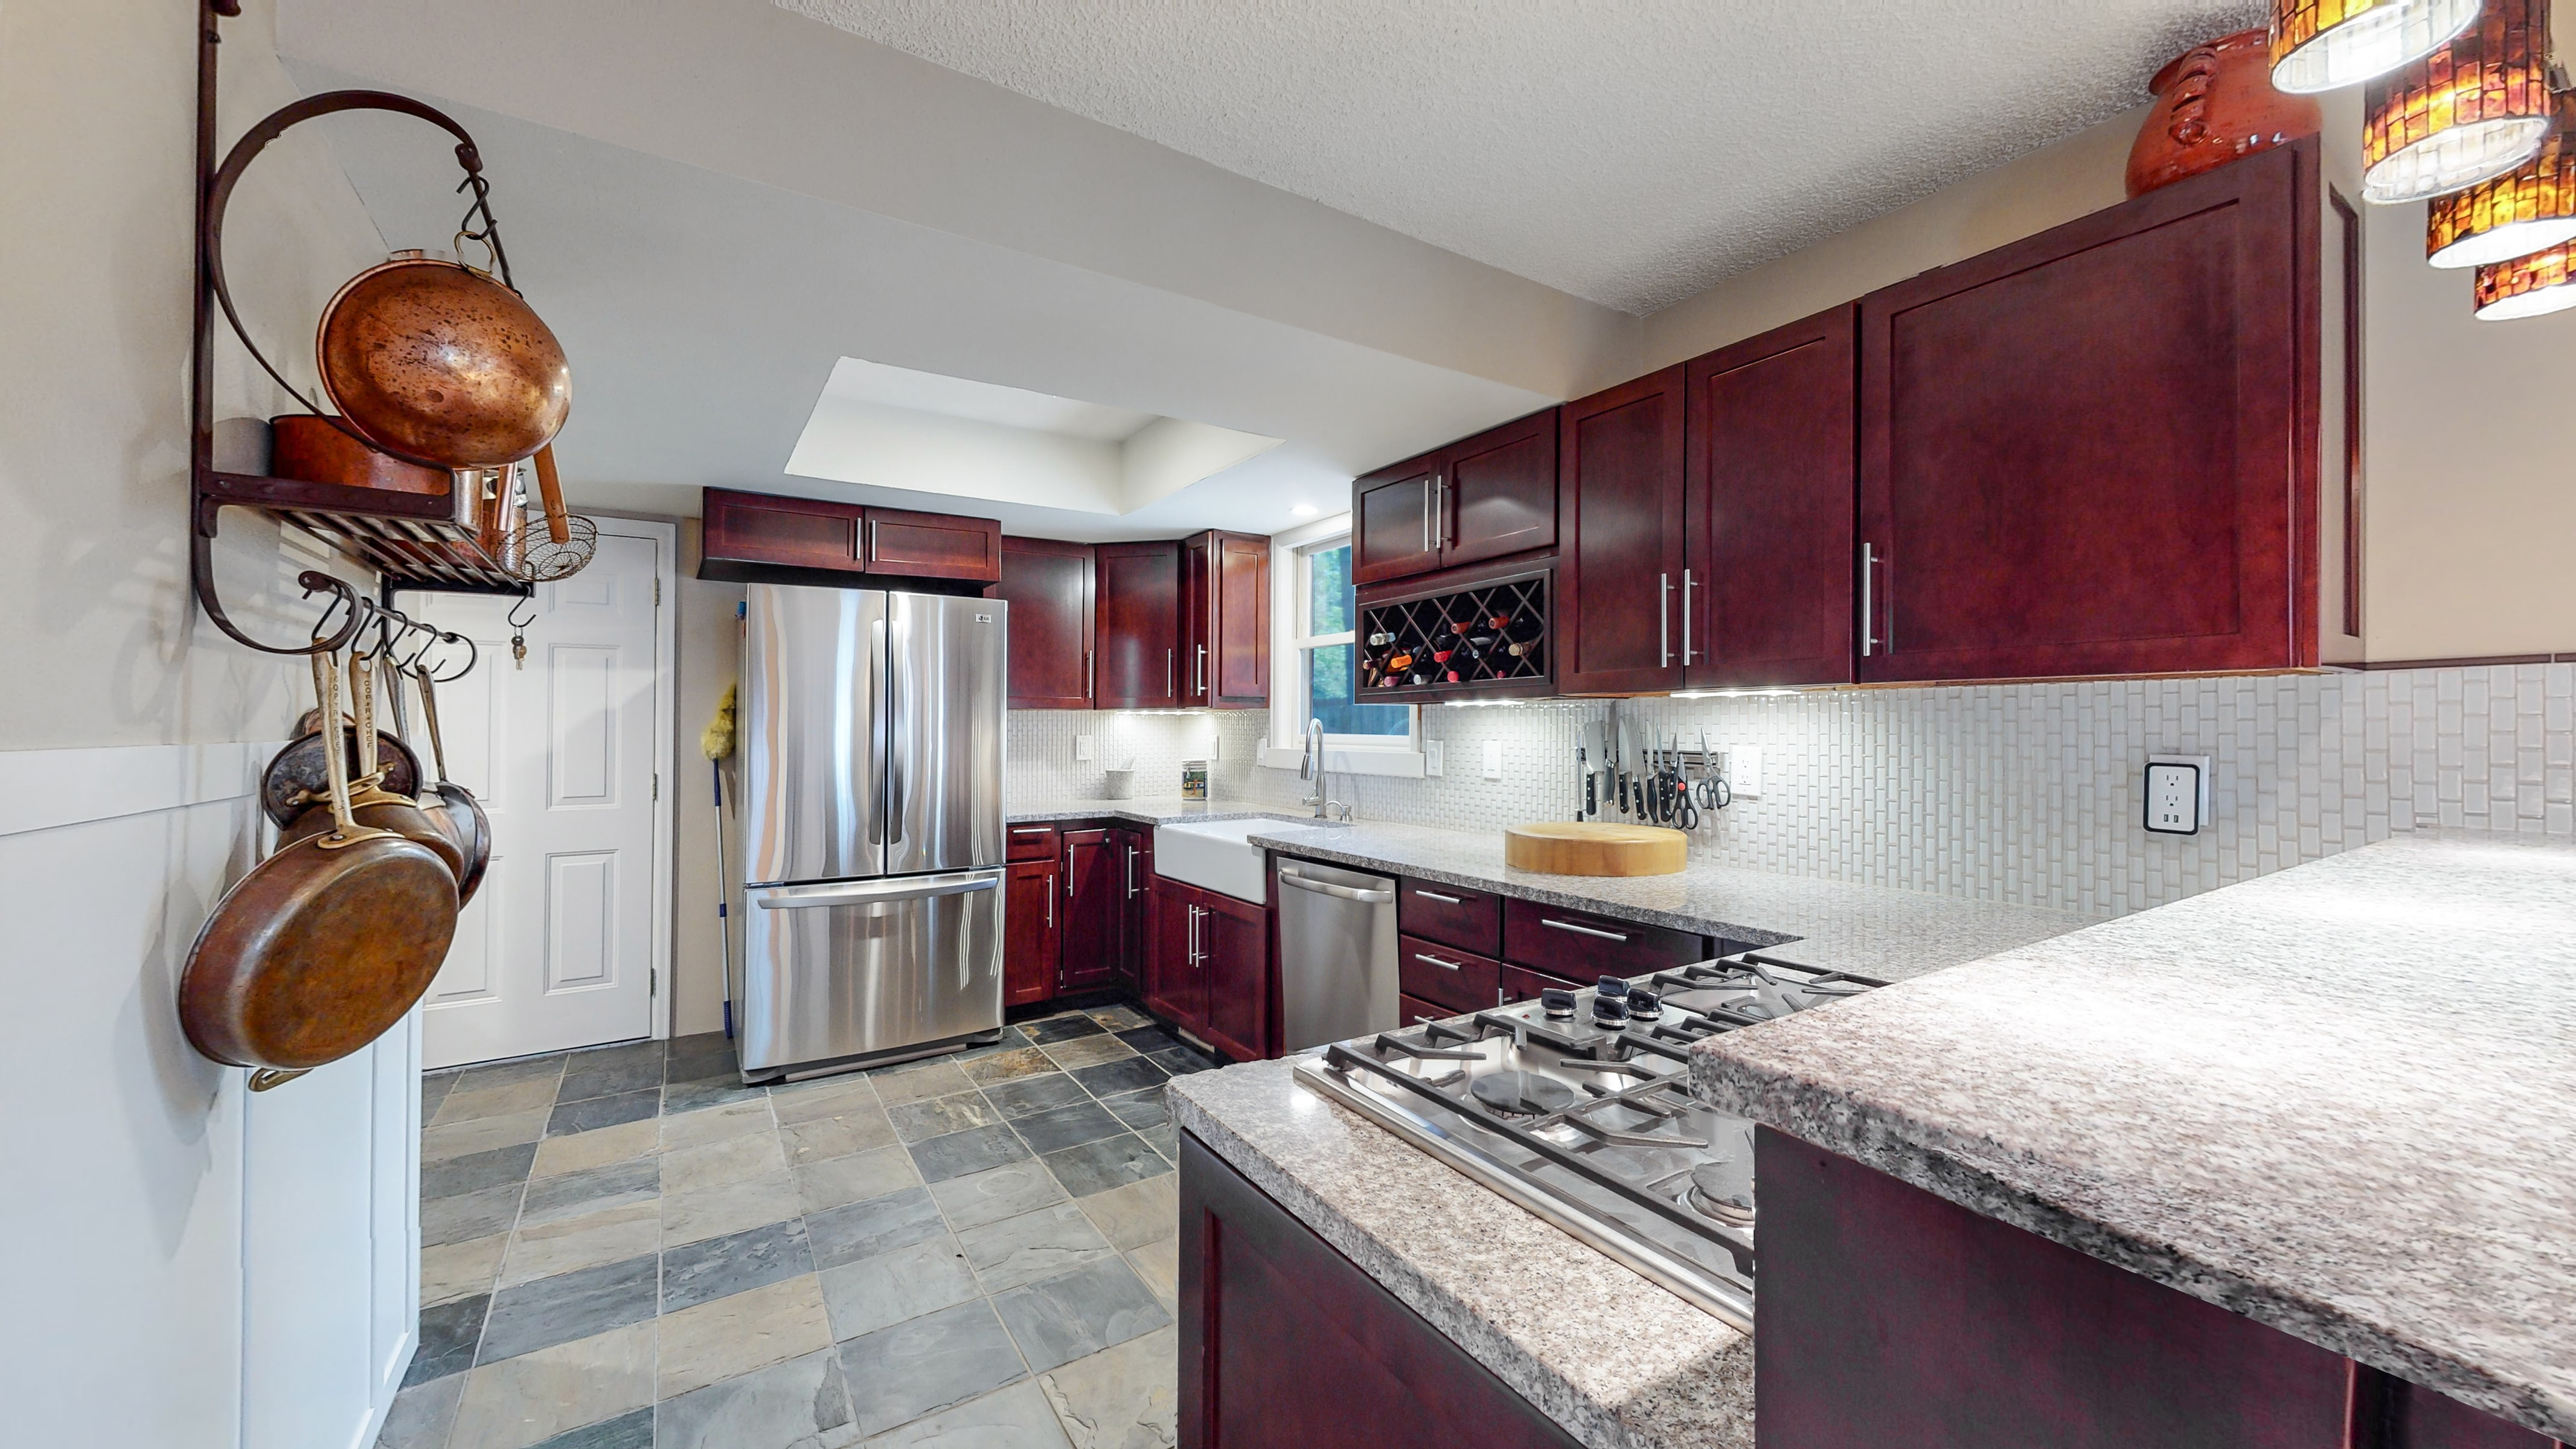 Custom kitchen, granite counters, stainless appliances, slate floor